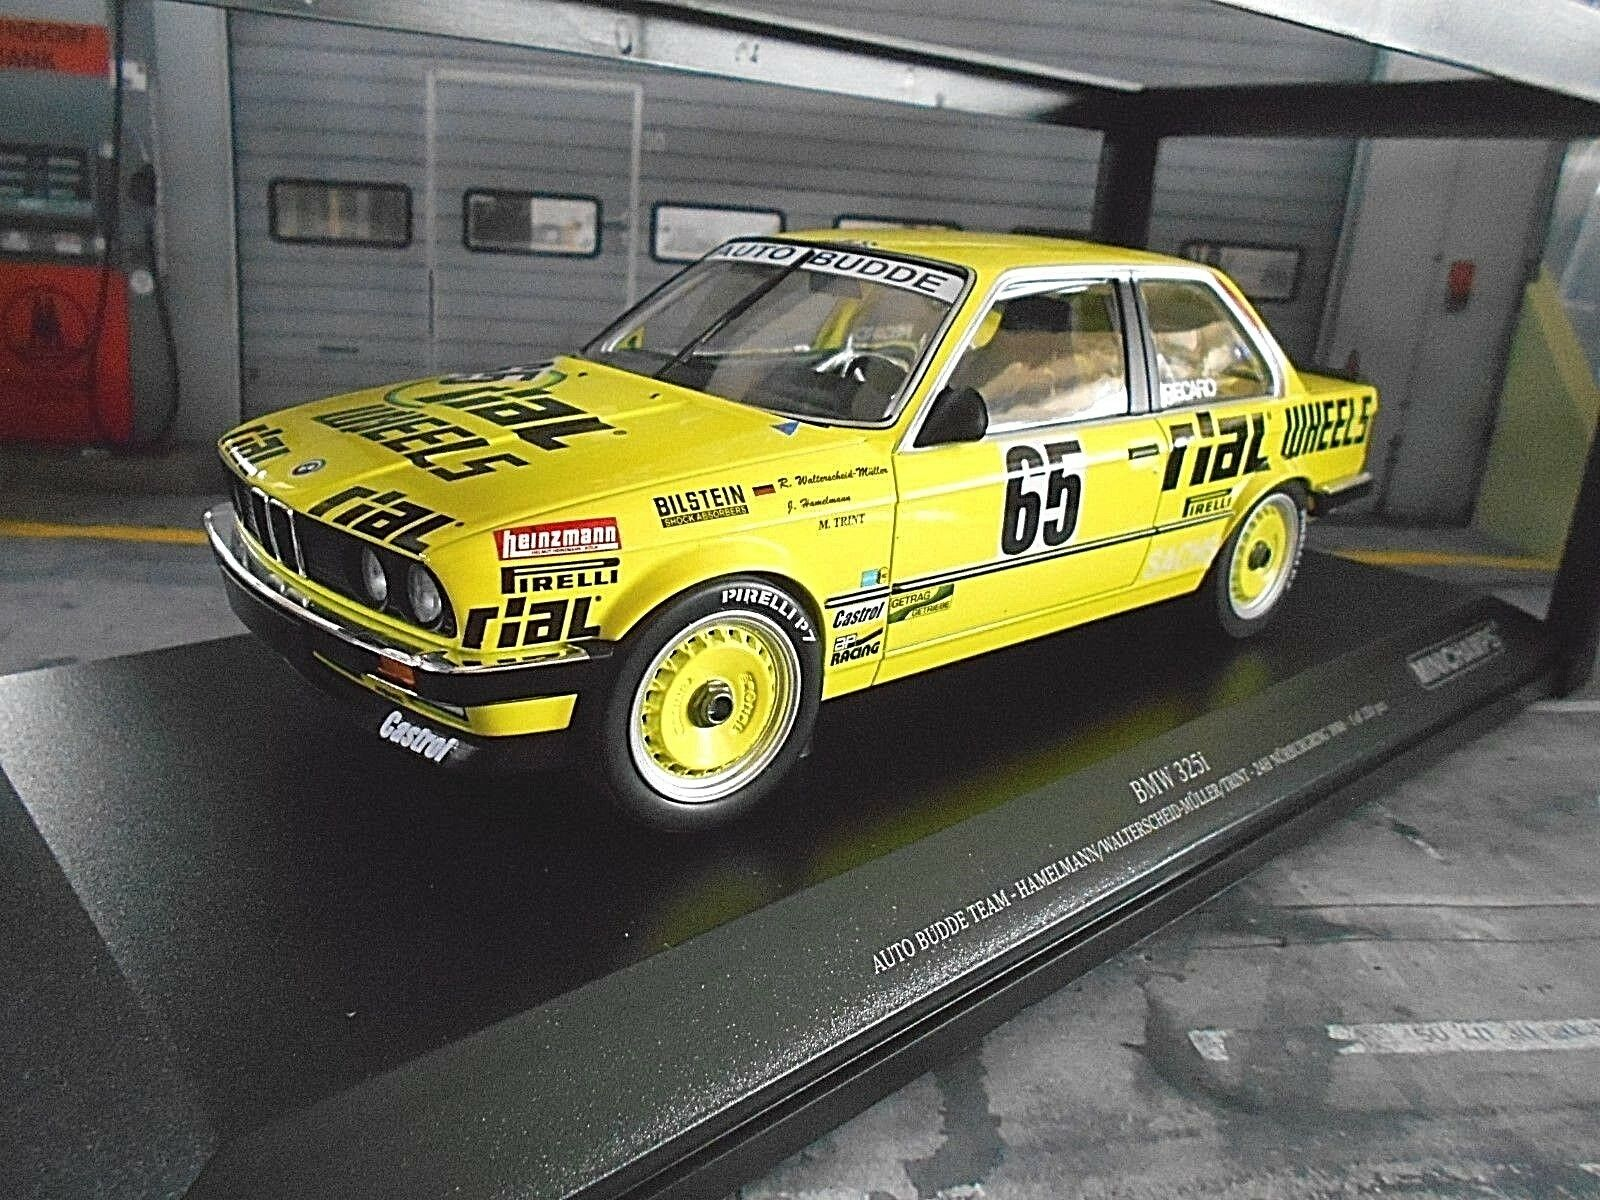 Bmw 325i 3er e30 24h nurburgring Budde Hammelmann Trint 1986 Minichamps 1 18